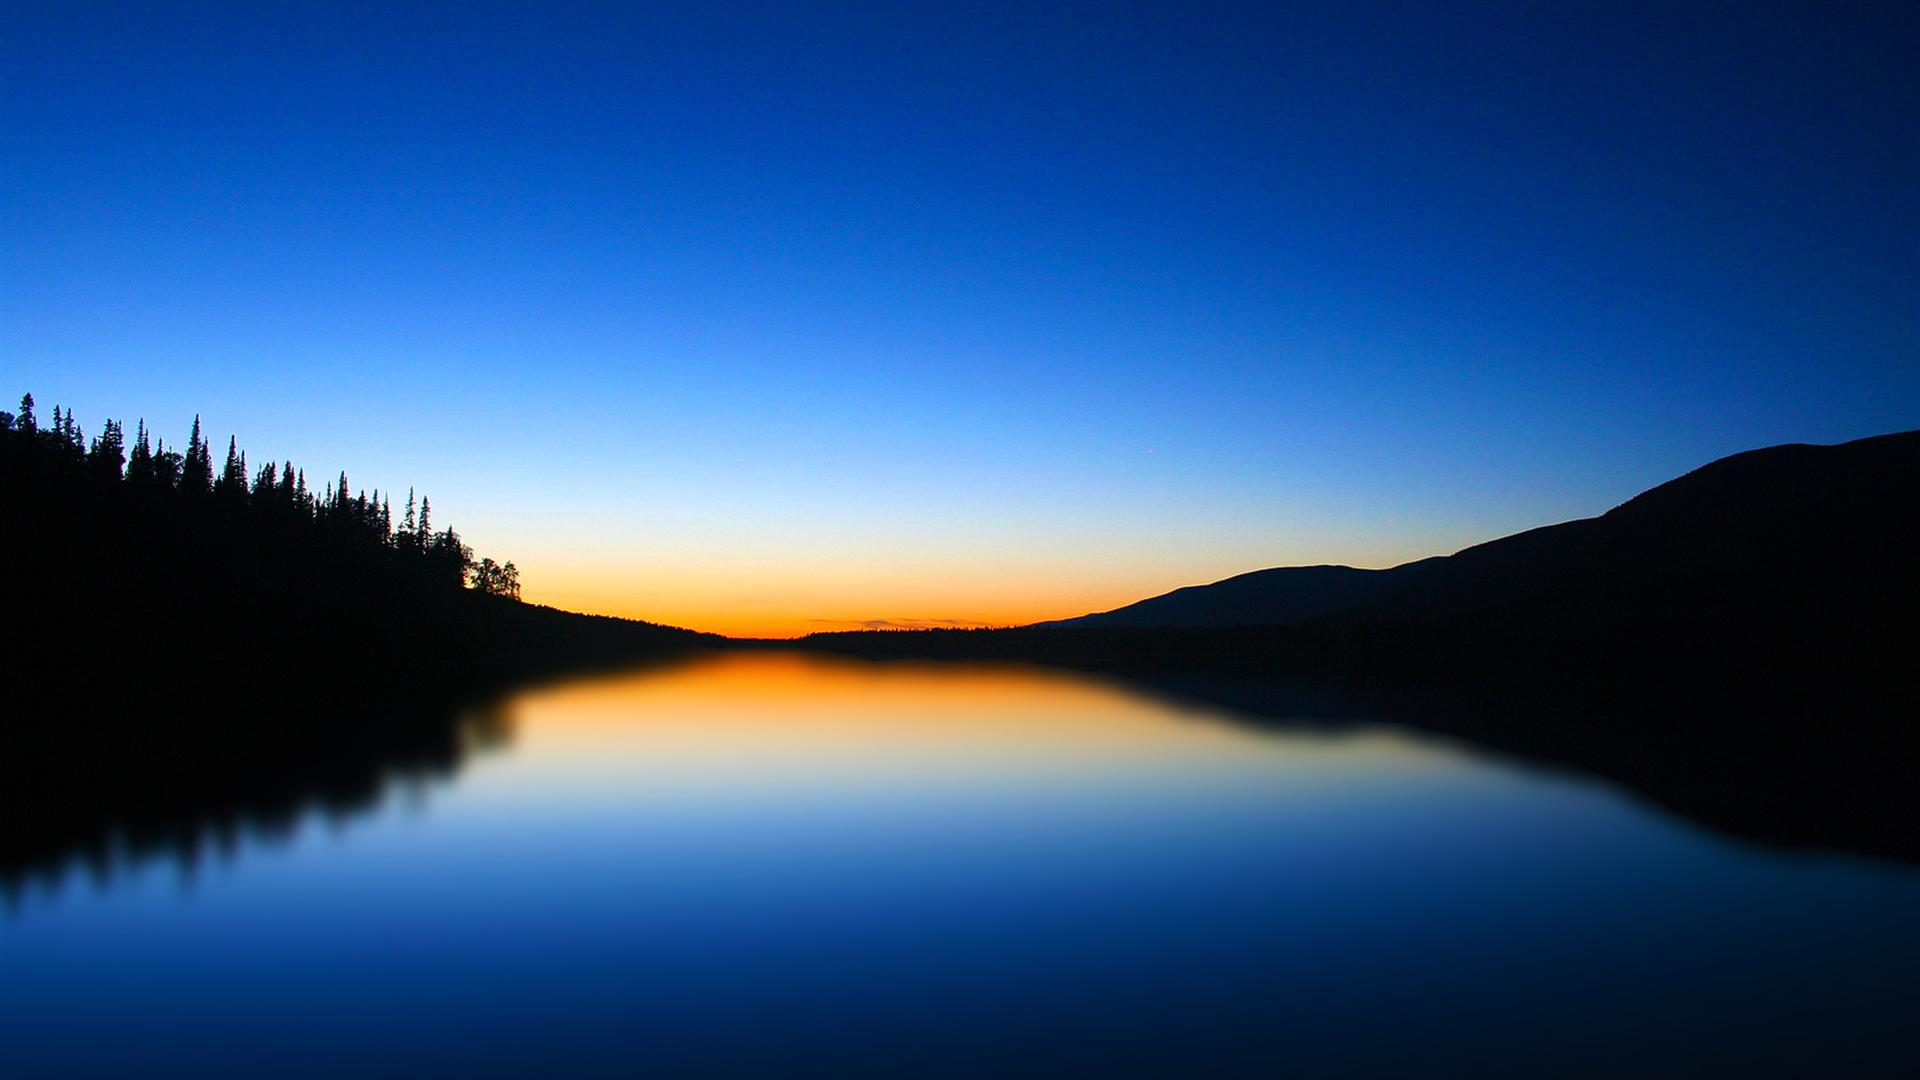 1920x1080 Hd Blue lake scenic wallpaper for windows 1920x1080